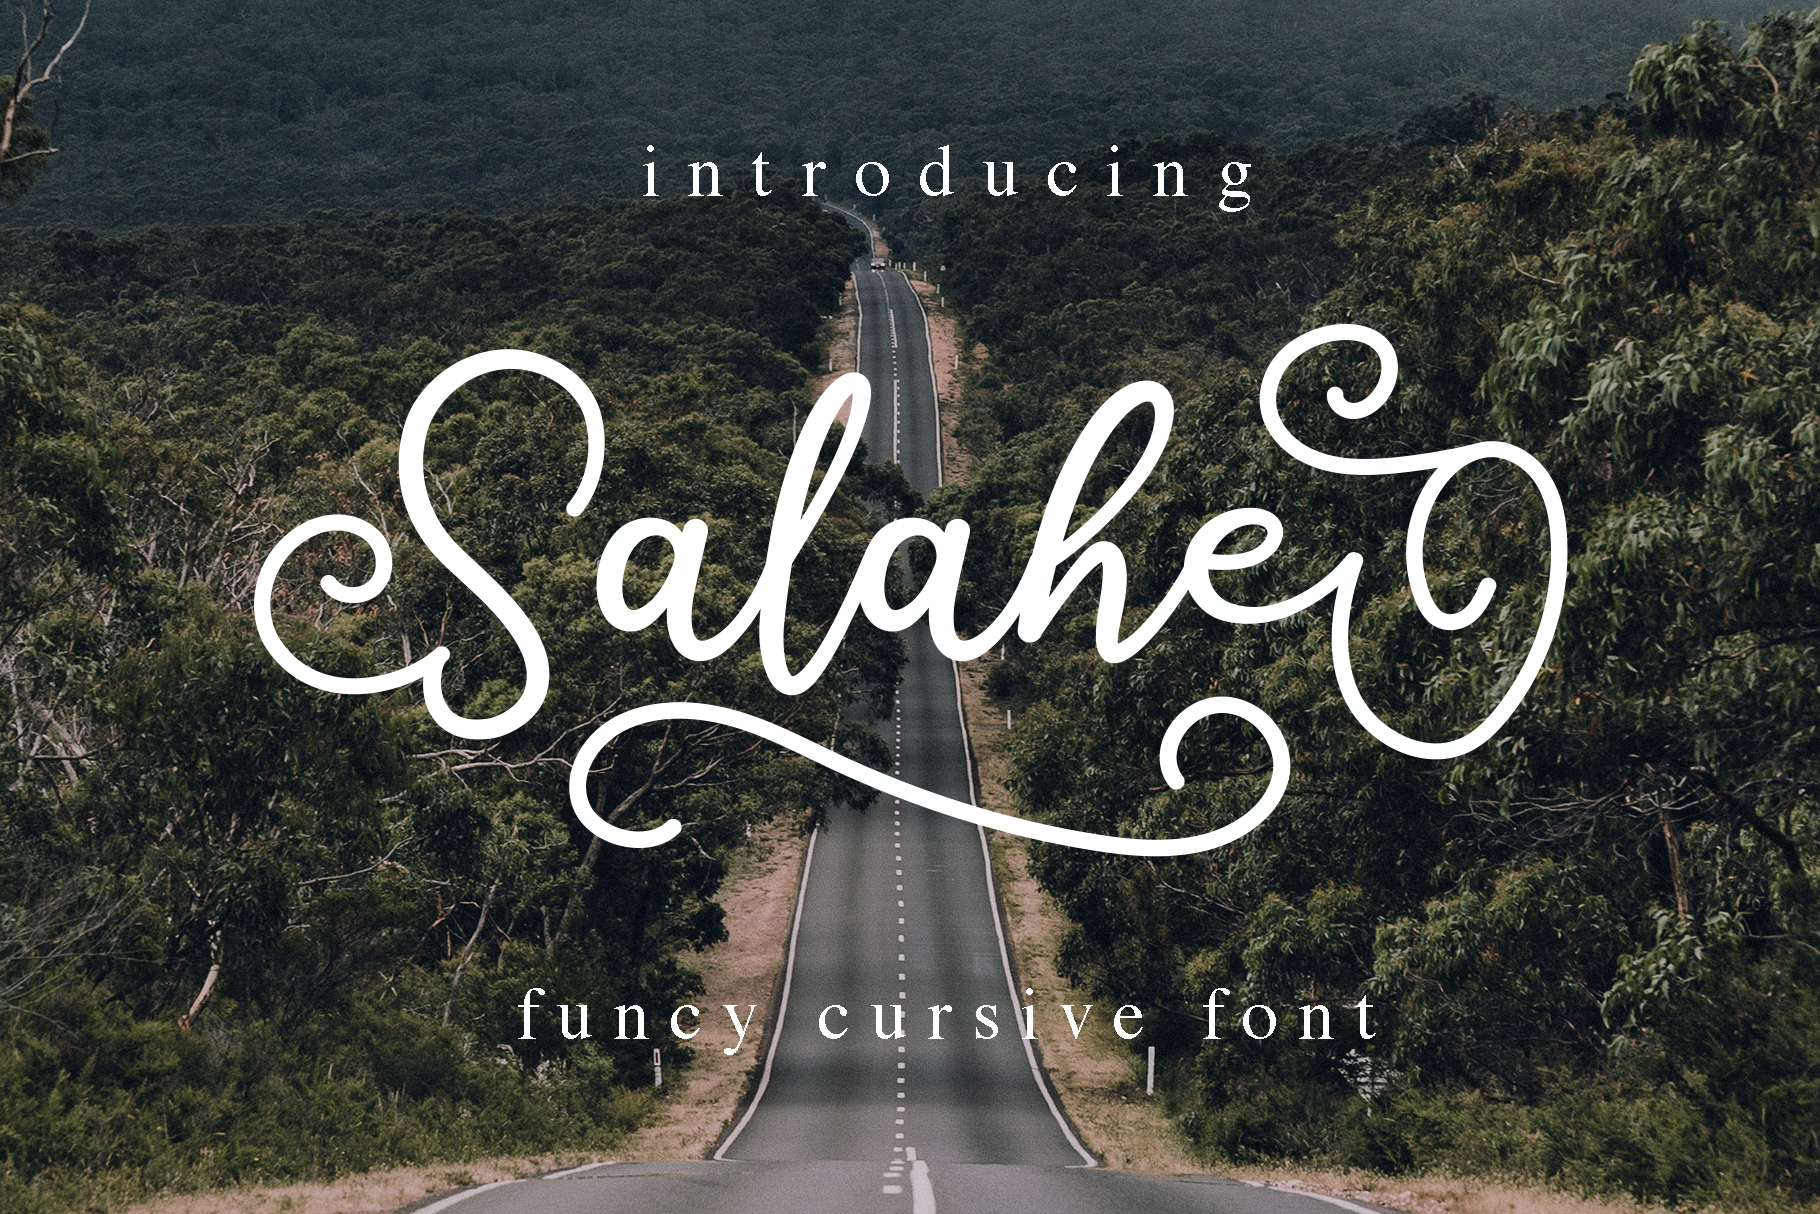 Salahe - a funcy cursive font example image 1